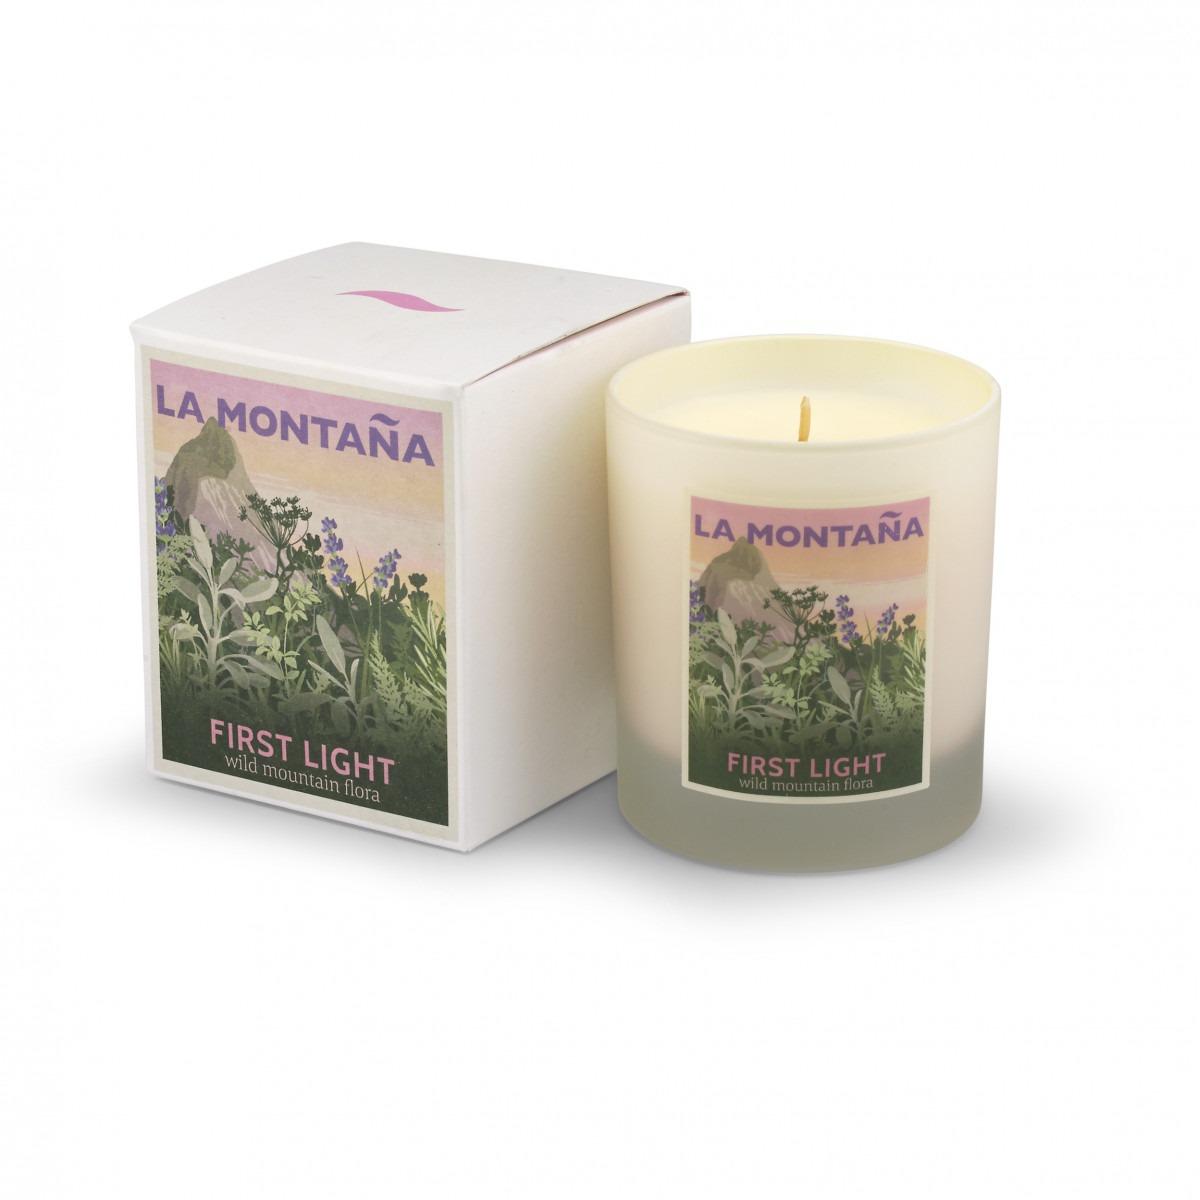 La Montaña First Light Candle